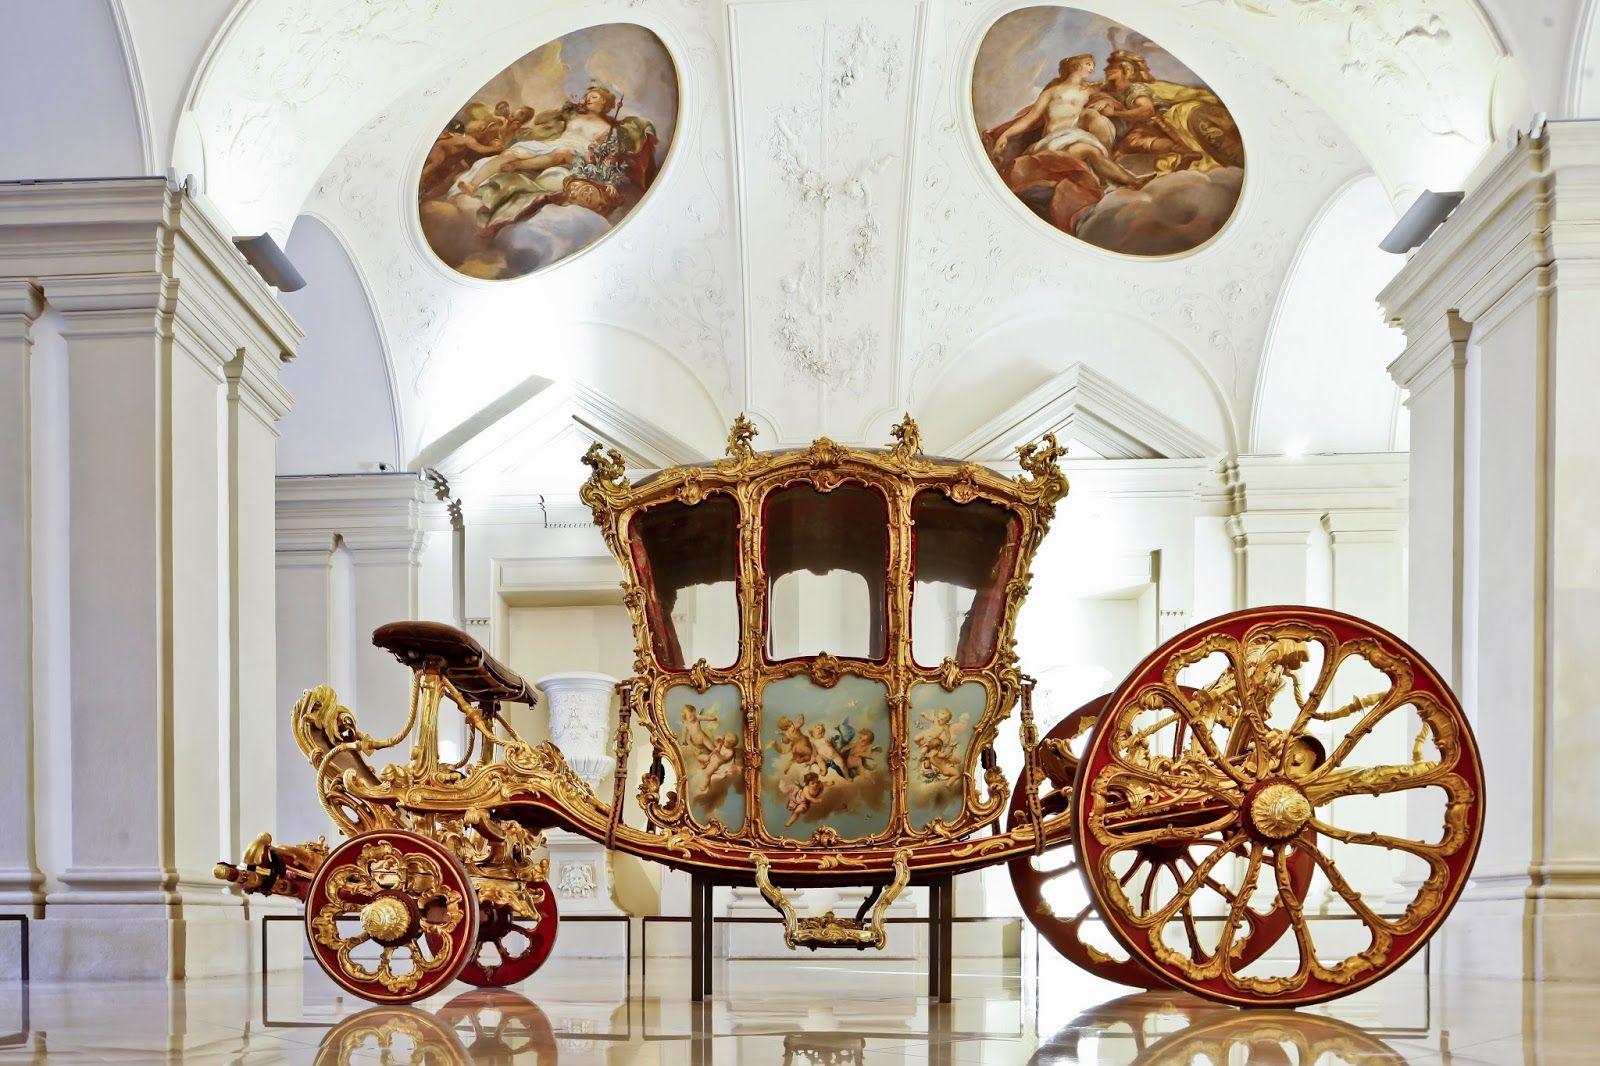 Luxarazzi Luxarazzi 101 Golden Carriage Of Prince Joseph Wenzel